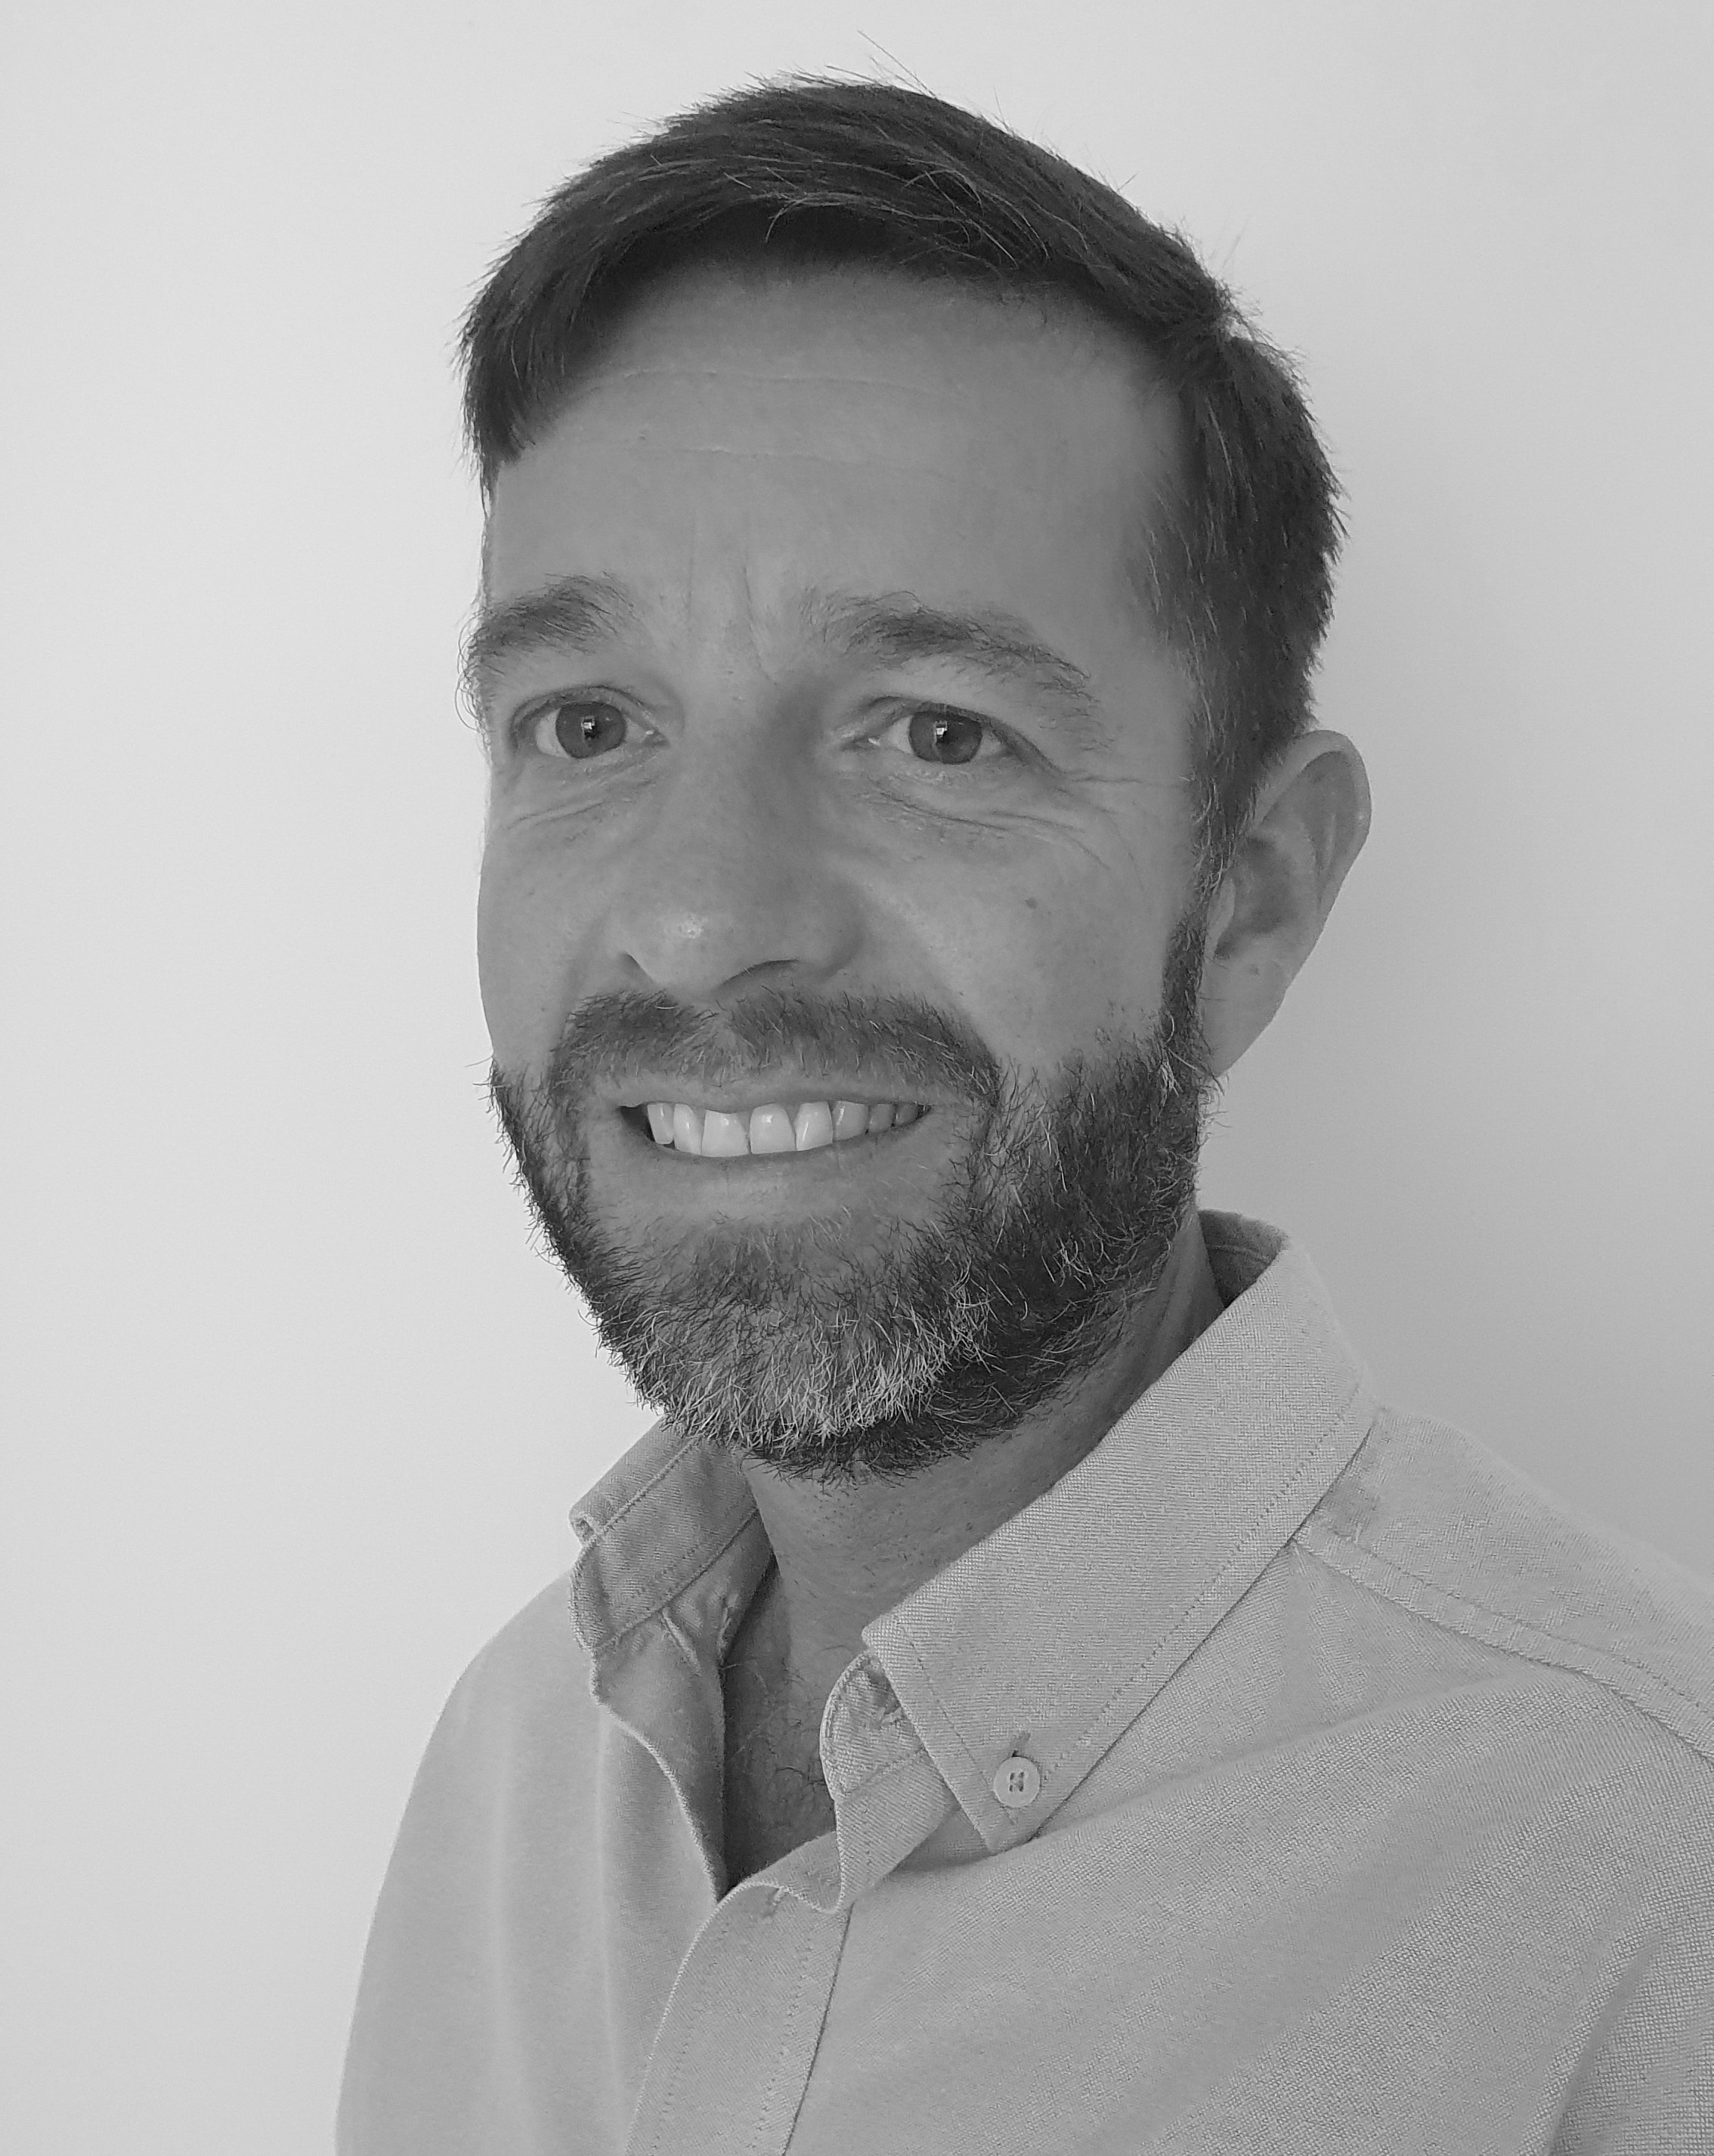 David Sisson